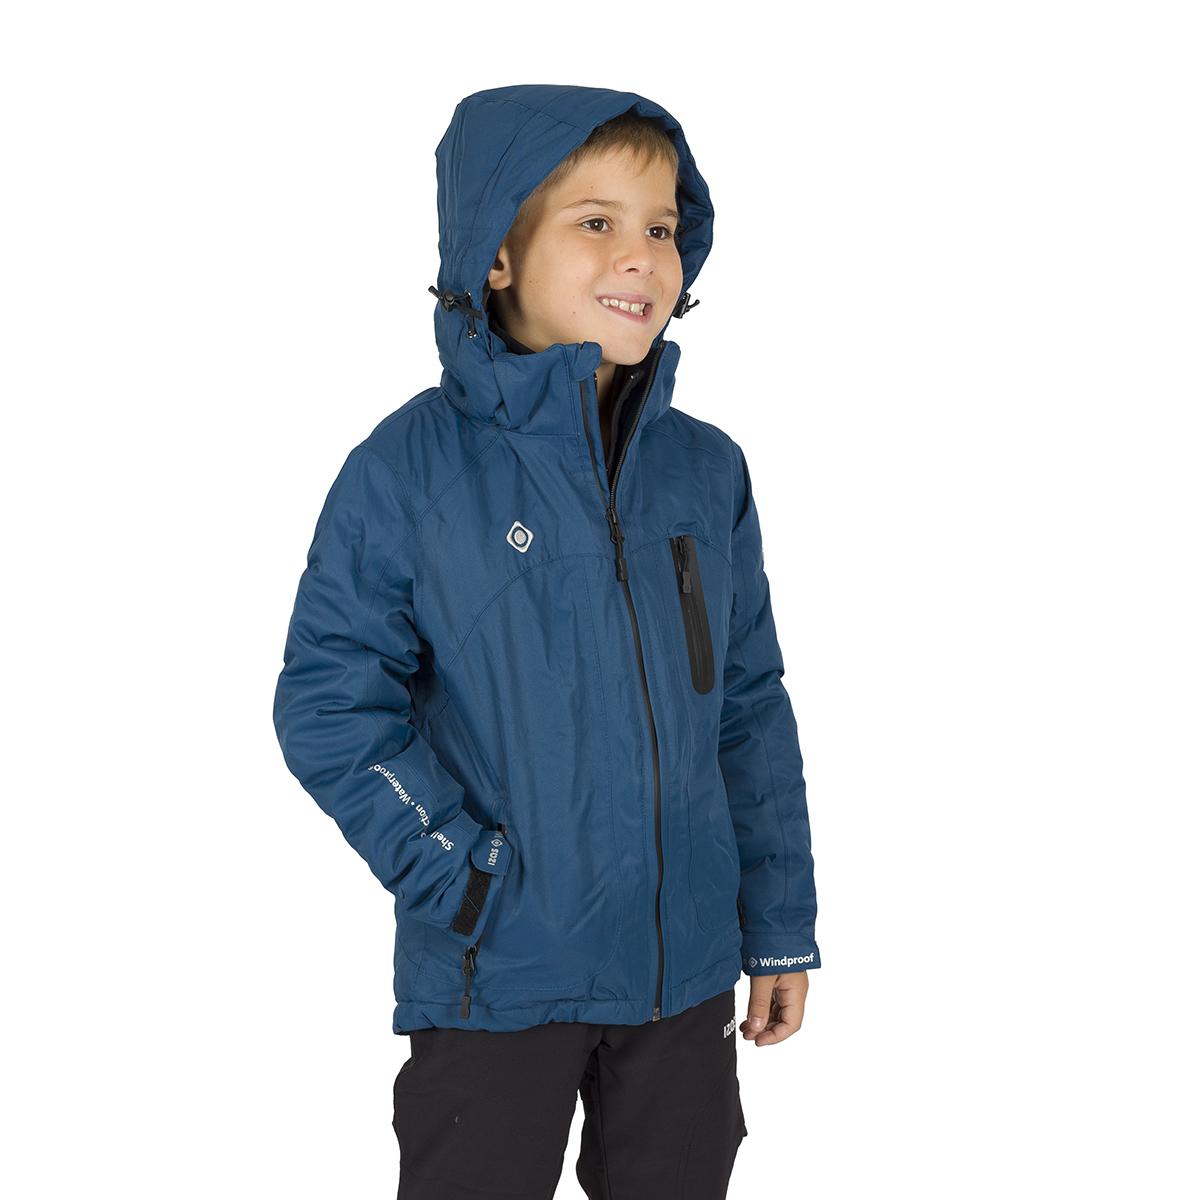 NALUNS KIDS PADDED JACKET WITH HOOD BLUE